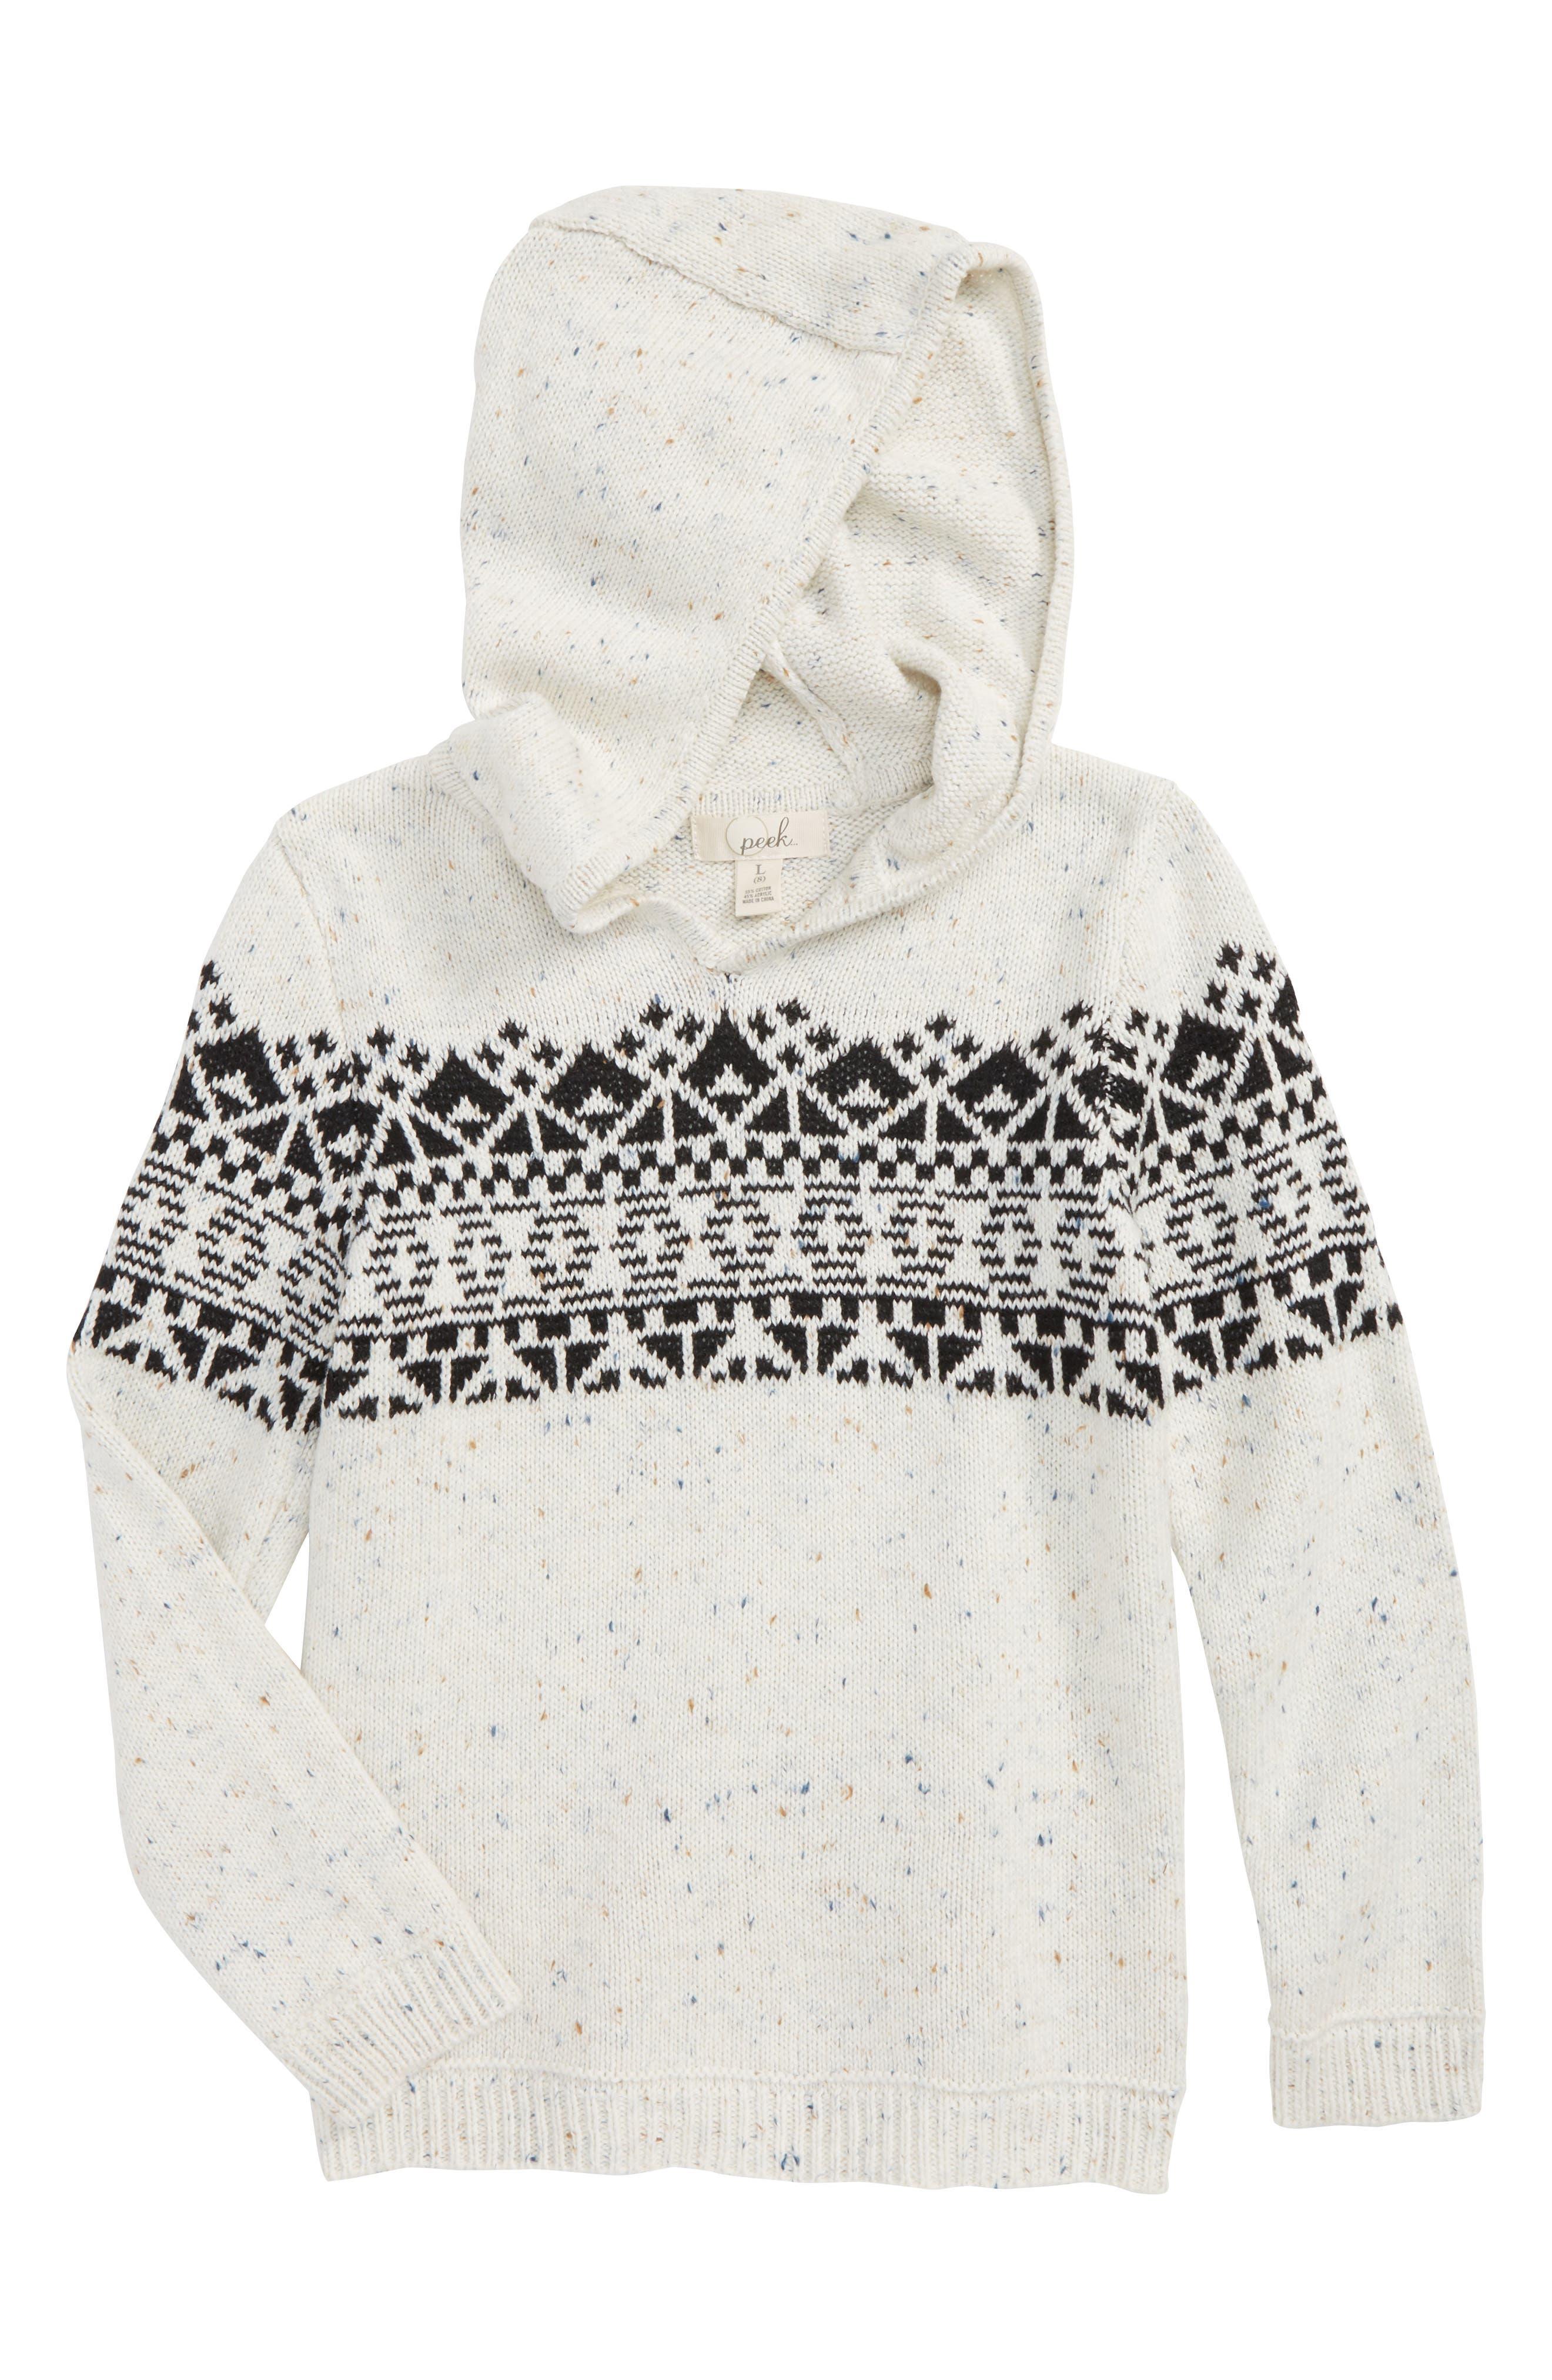 Peek Benny Hooded Knit Sweater (Toddler Boys, Little Boys & Big Boys)